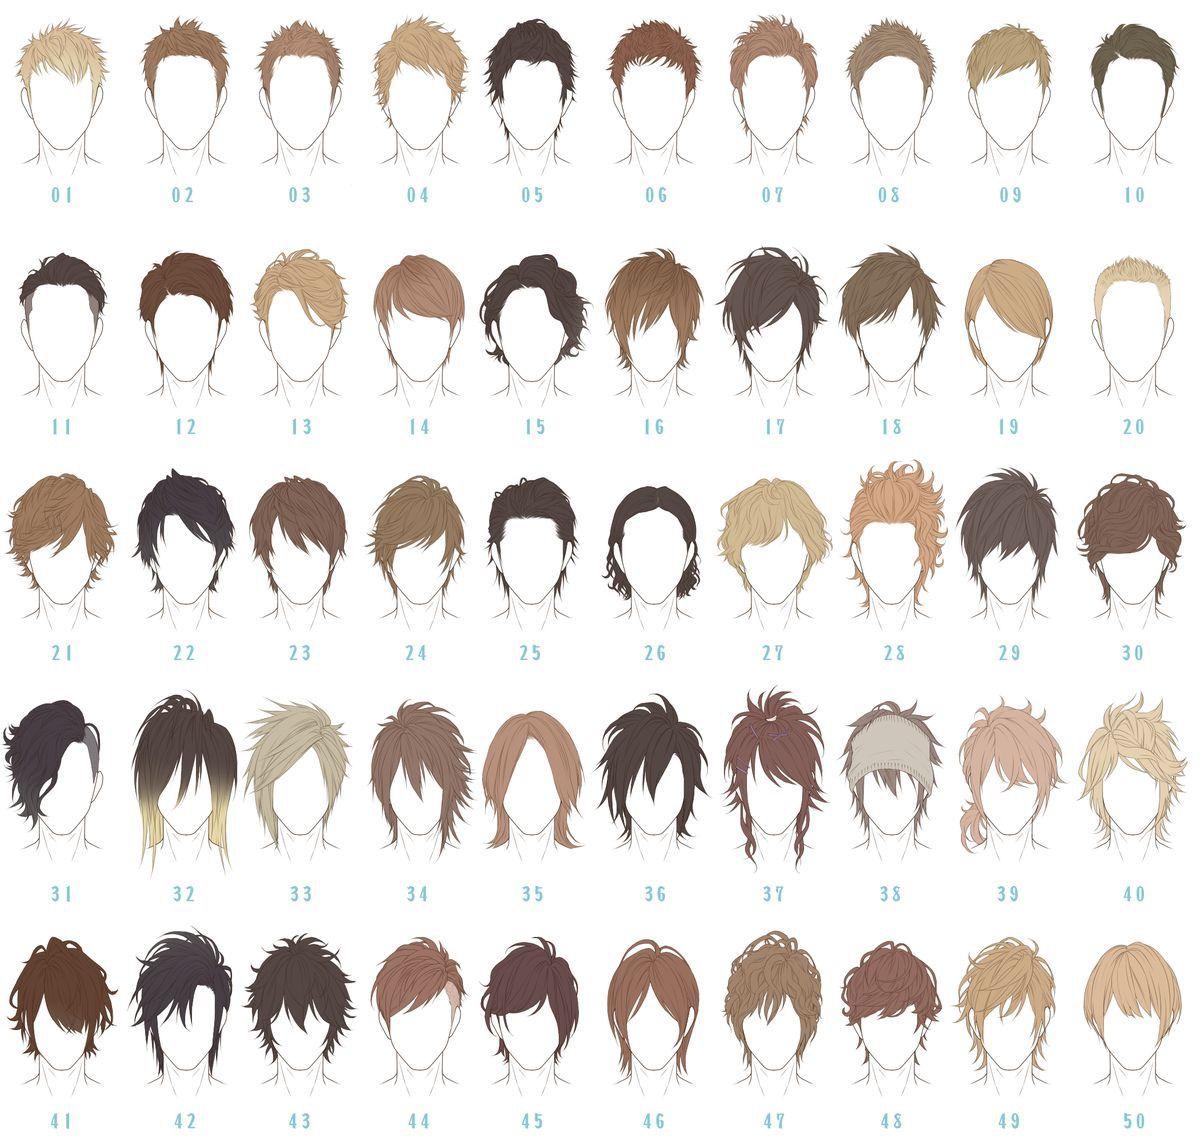 Drawing Short Hairs Anime Boy Hair Manga Hair Anime Hairstyles Male